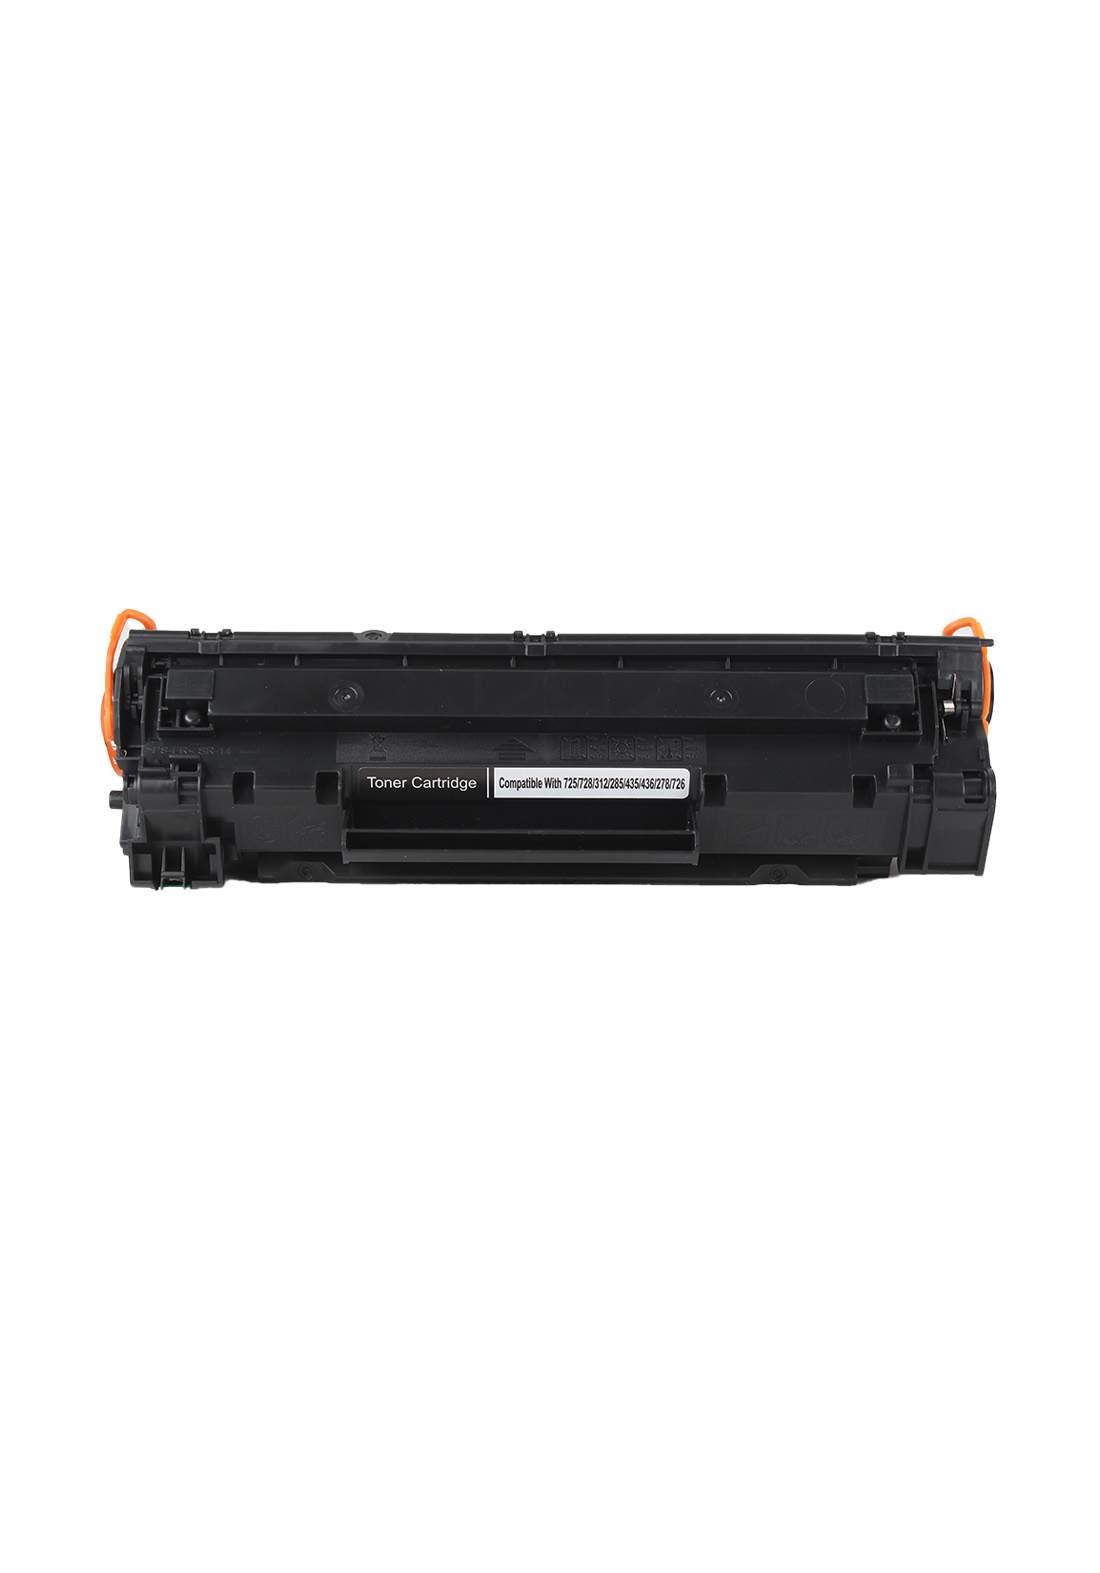 Power Tiger 725/728/285A/278A Laser Printer Toner Cartridge خرطوشة حبر